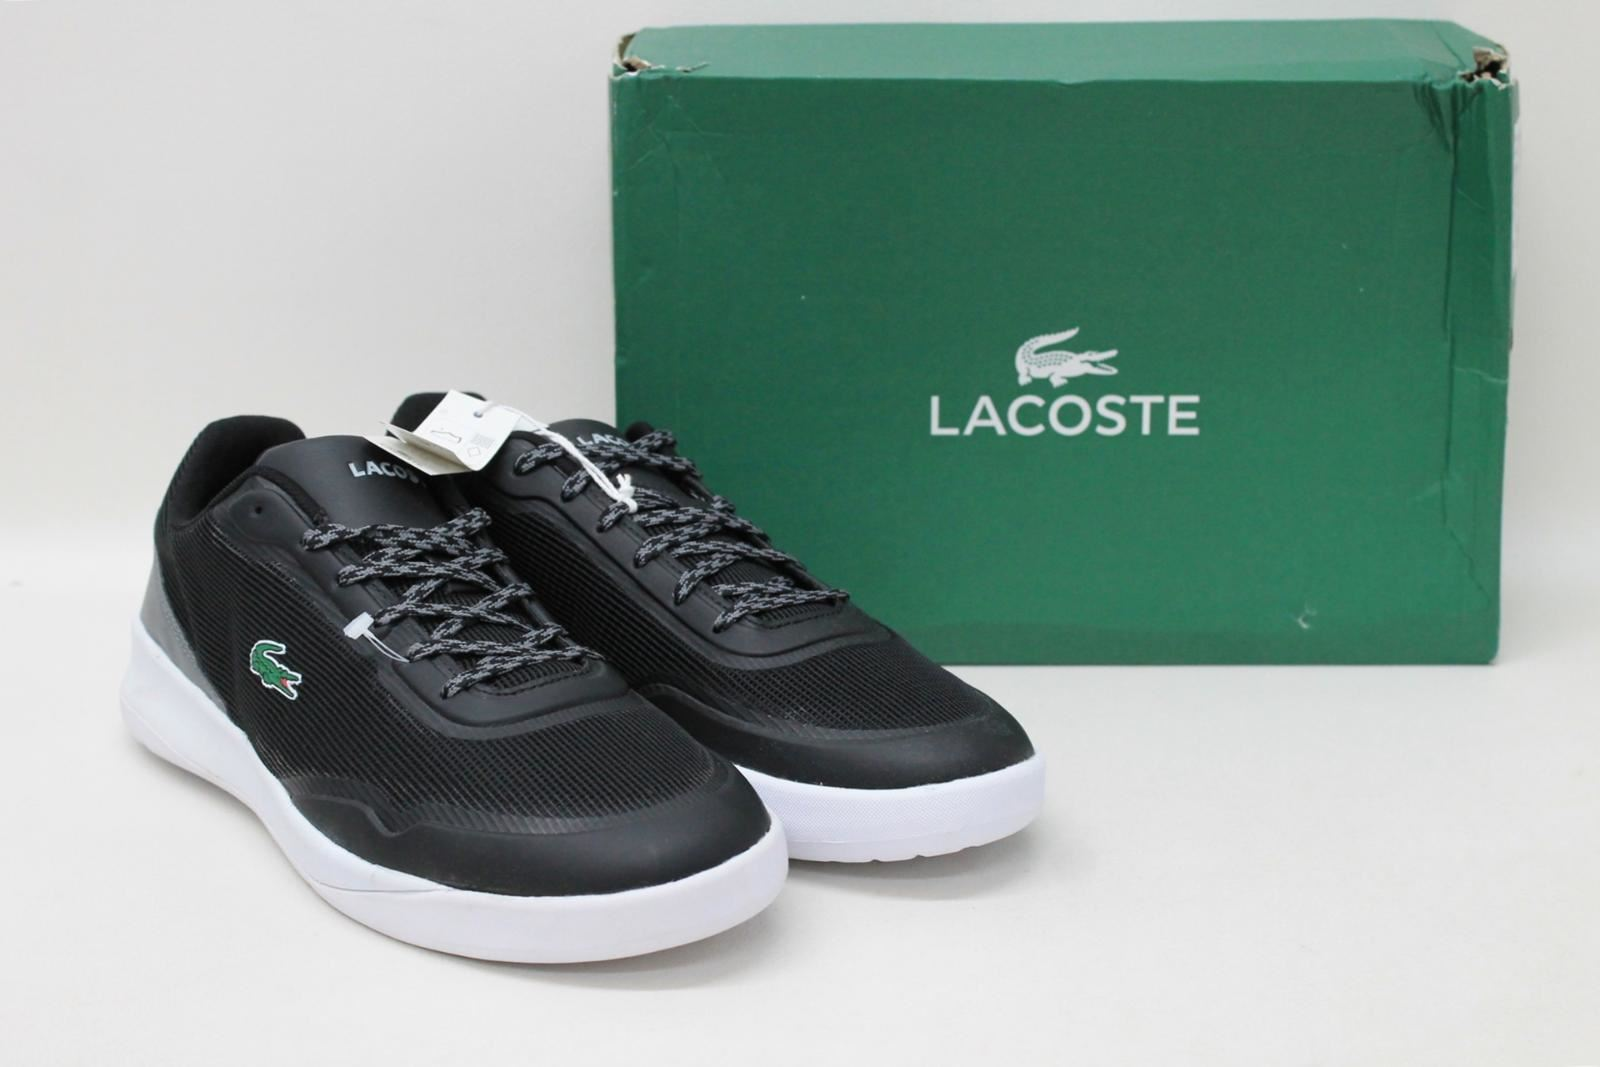 BNIB LACOSTE Men's Black Grey White Running Sport Trainers shoes Size UK9